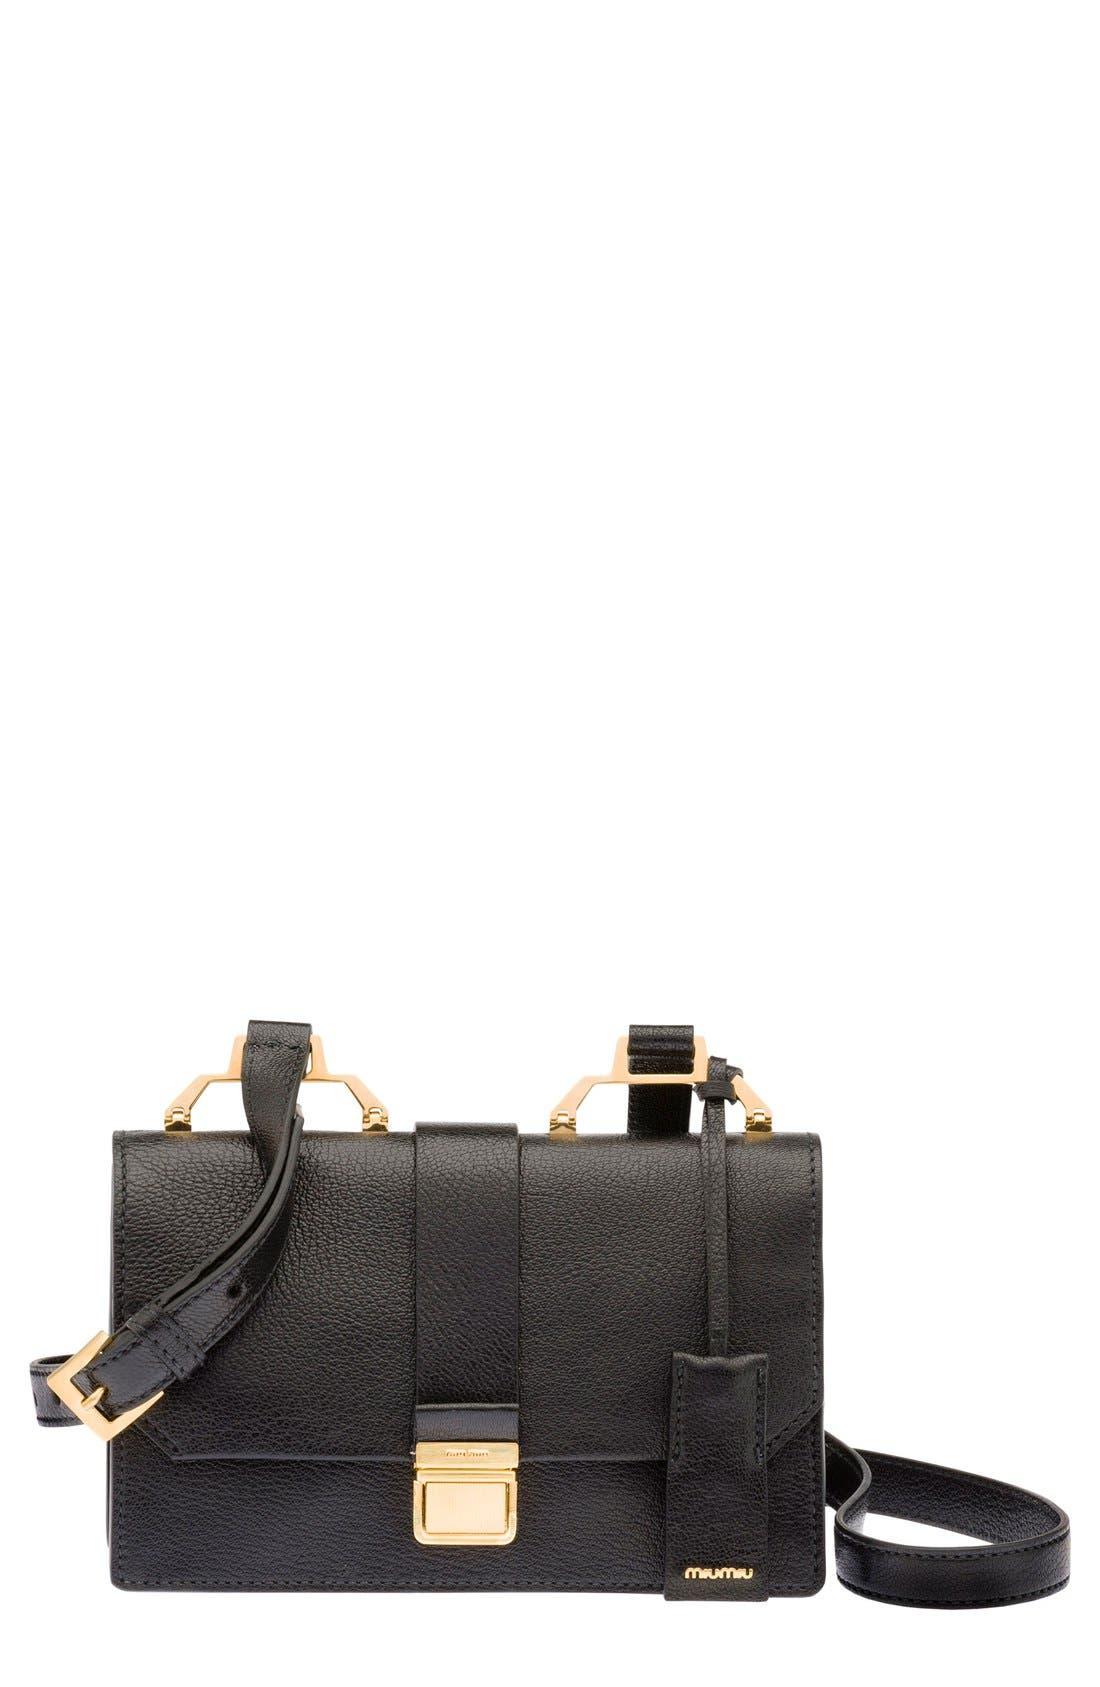 Alternate Image 1 Selected - Miu Miu 'Small Madras' Goatskin Leather Shoulder Bag